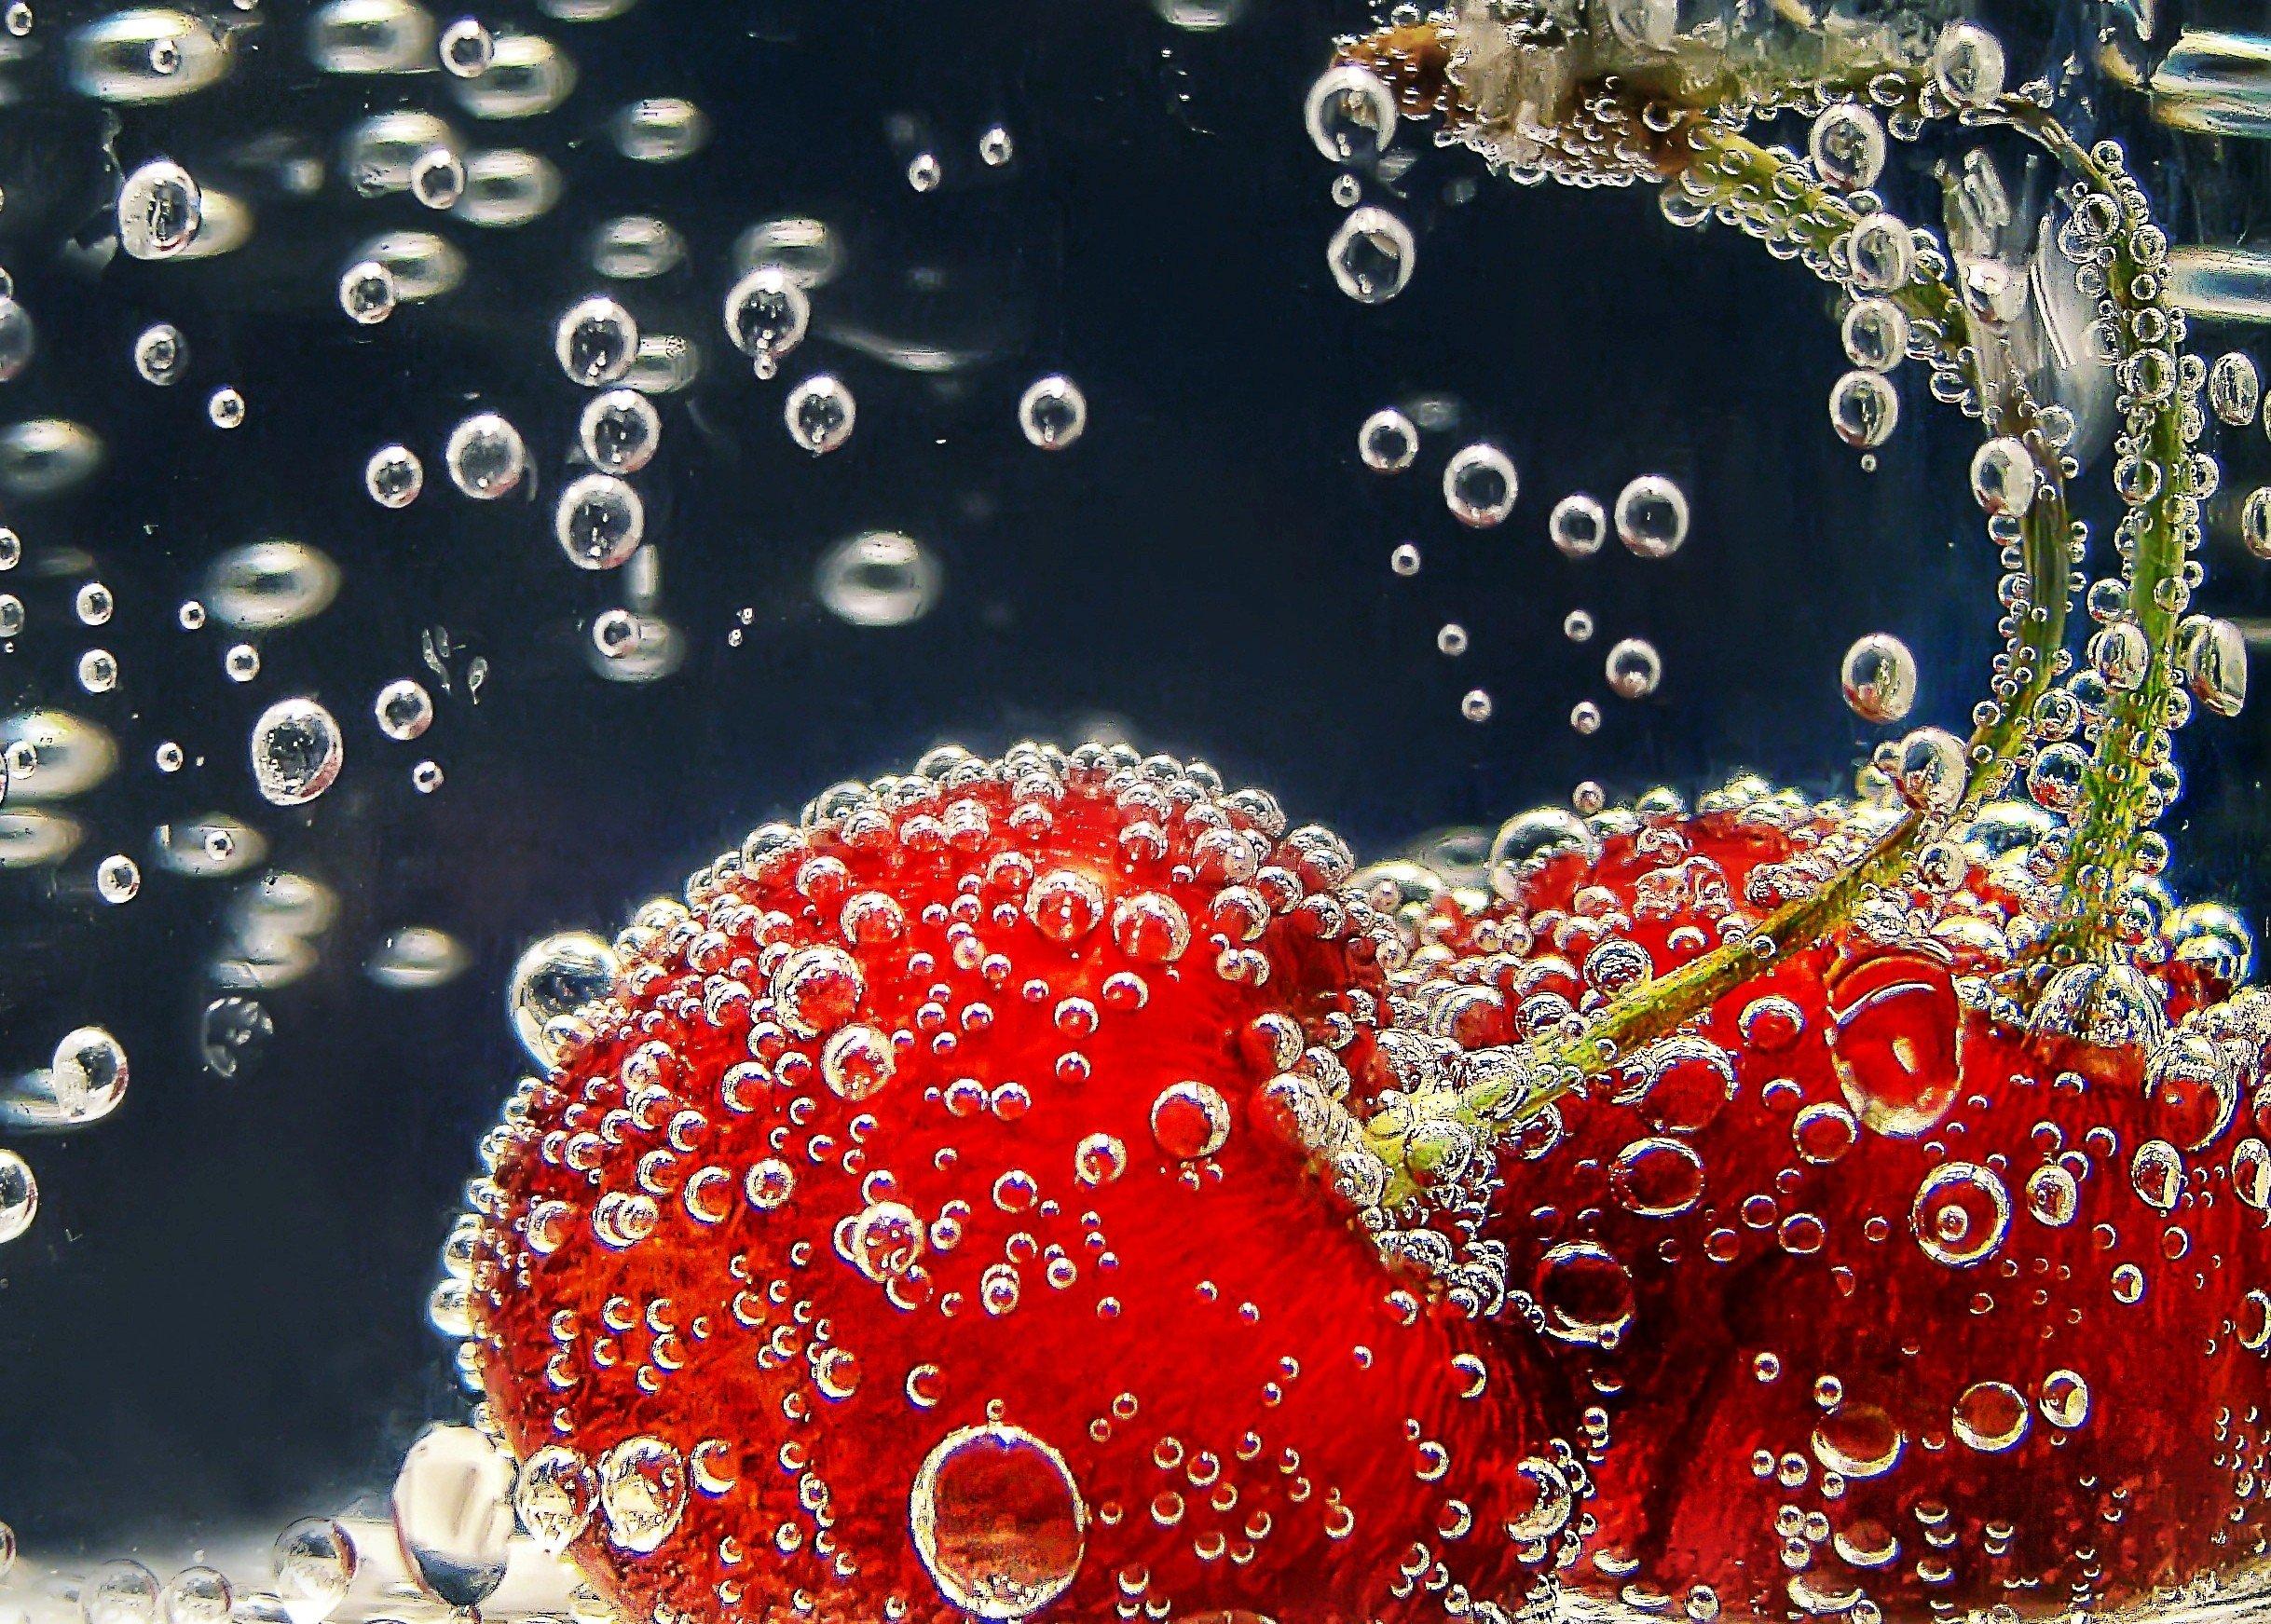 2437x1743 px bokeh bubbles cherries cherry fruit underwater 1714655